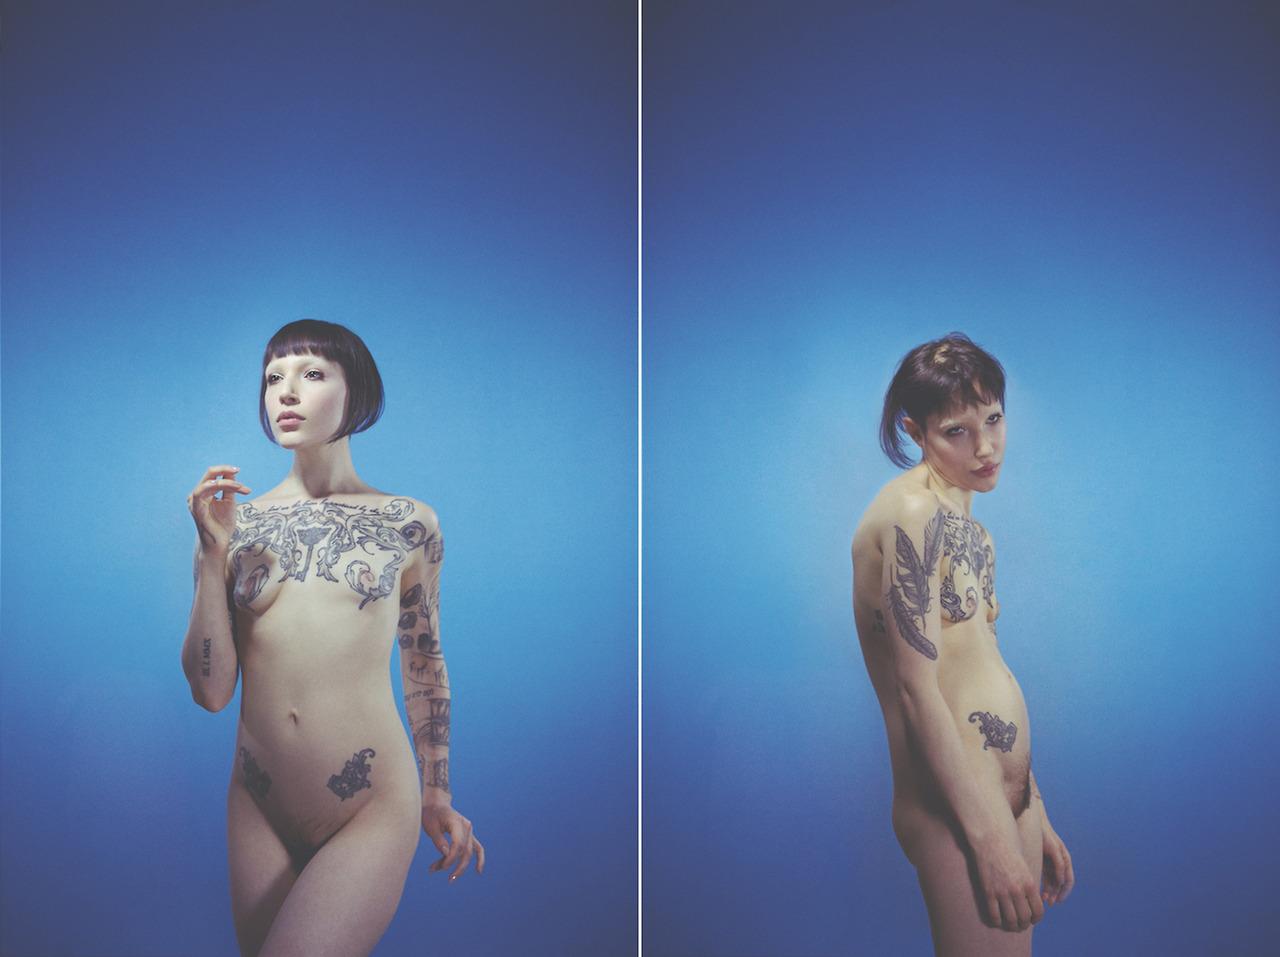 clara rae [Illusions of the Body] Photographer:Gracie Hagen